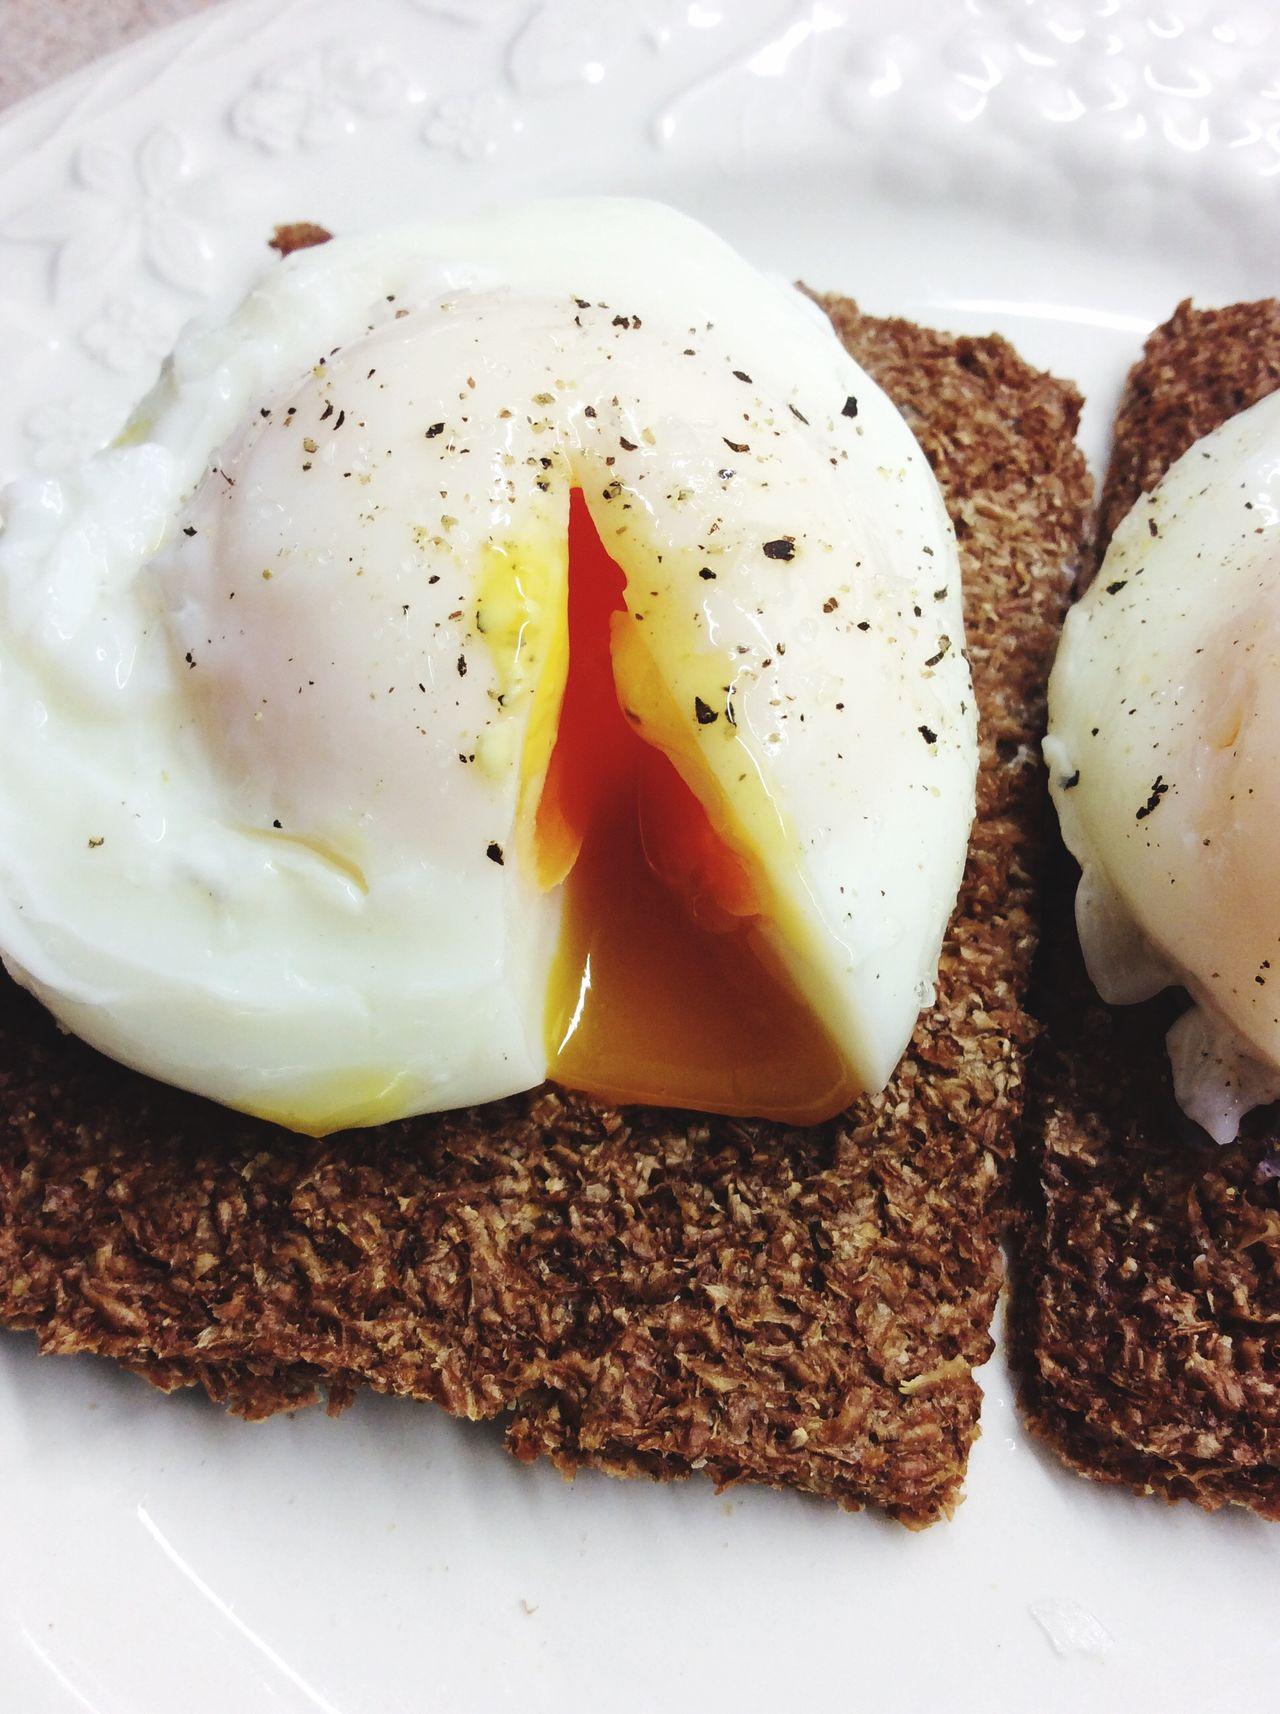 Poached Poached Eggs  Egg Food Healthy Eating Egg Yolk Breakfast Black Peppercorn Oatbran Crispbread  Healthy Lifestyle Healthyliving Healthylifestyle